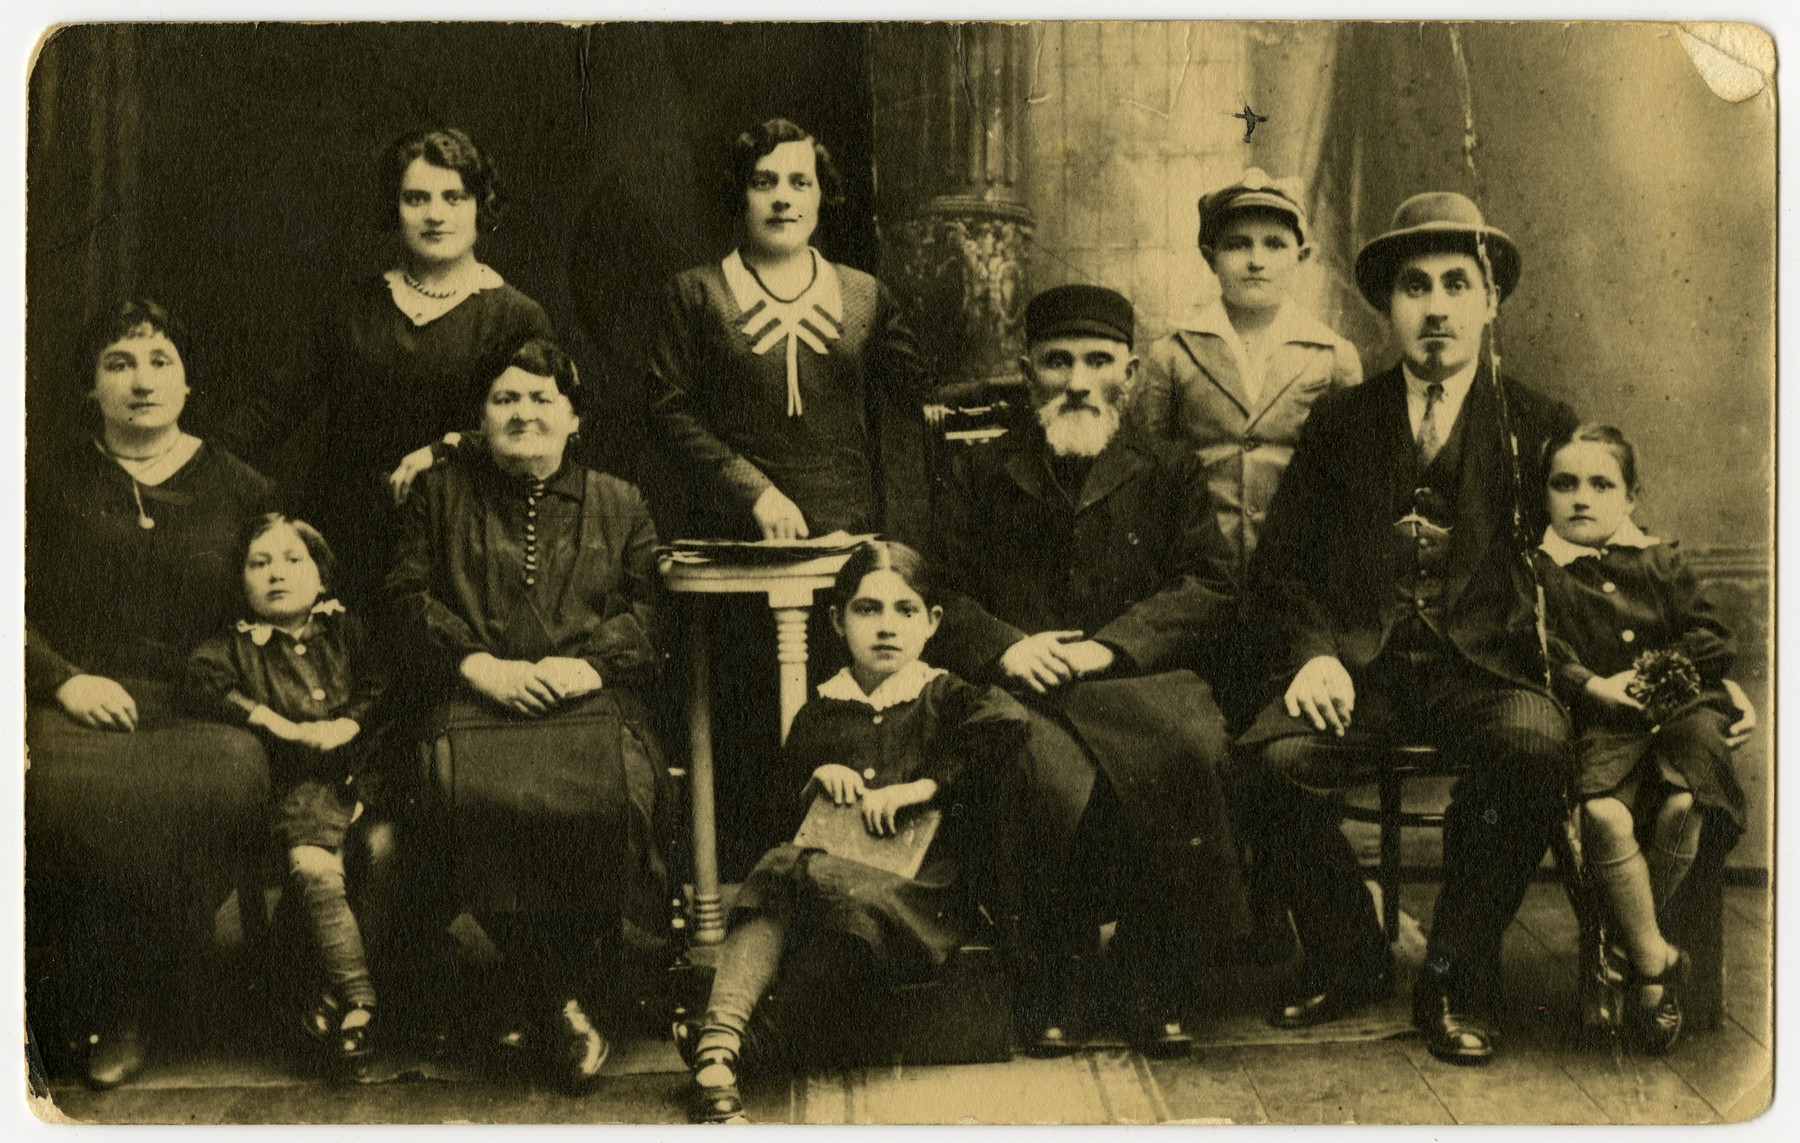 Prewar studio portrait of the Sadik and Opalka family.  From let to right are seated: Ruchel Kala (nee Opalka) Sadik, Rivke Sadik, Esther Opalka, Golda Sadik, Abraham Opalka, Yosef Sadik and Rivke Sadik.  Standing are Gittel Opalka, Fradel Opalka and Nachman Mendel Sadik.